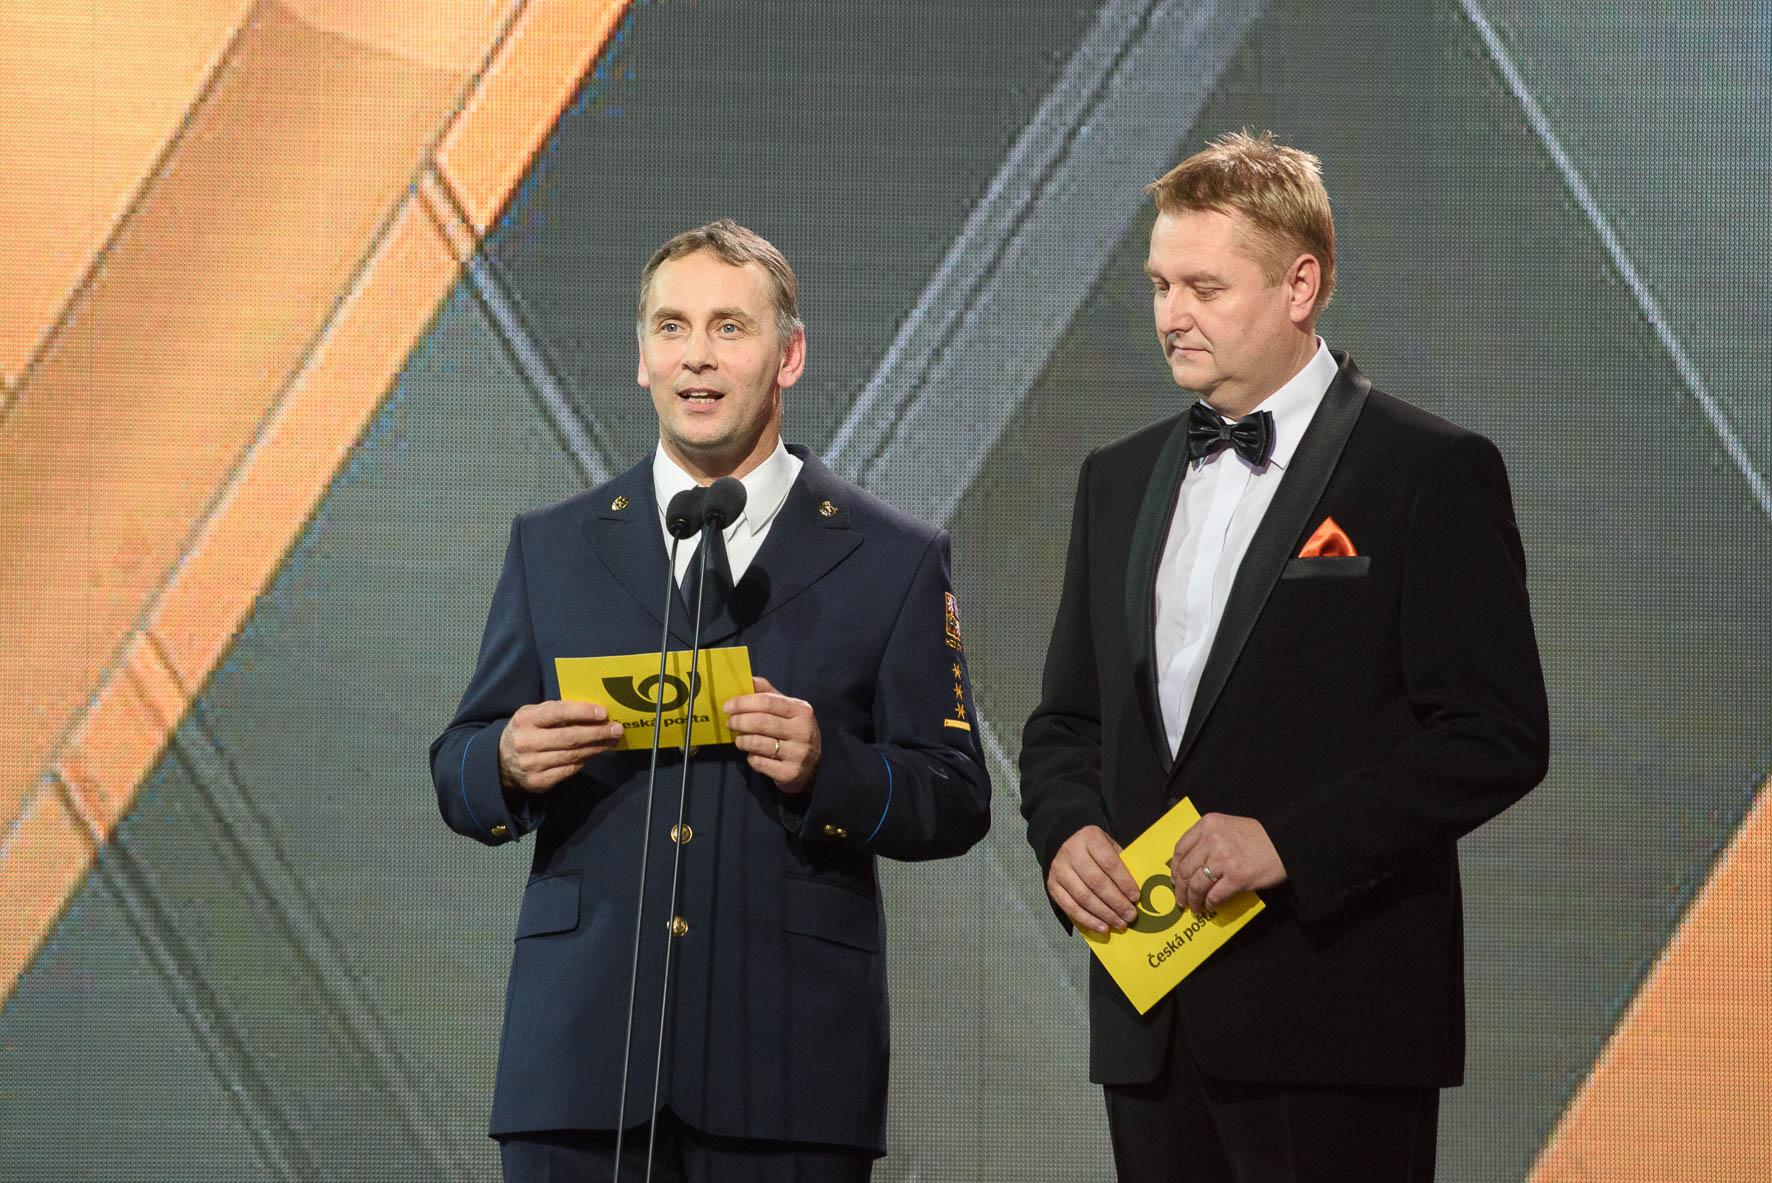 anketa-dobrovolni-hasici-roku-2015-vyhlaseni-vysledku-vaclav-spera-zajezd-vitkovice-tours